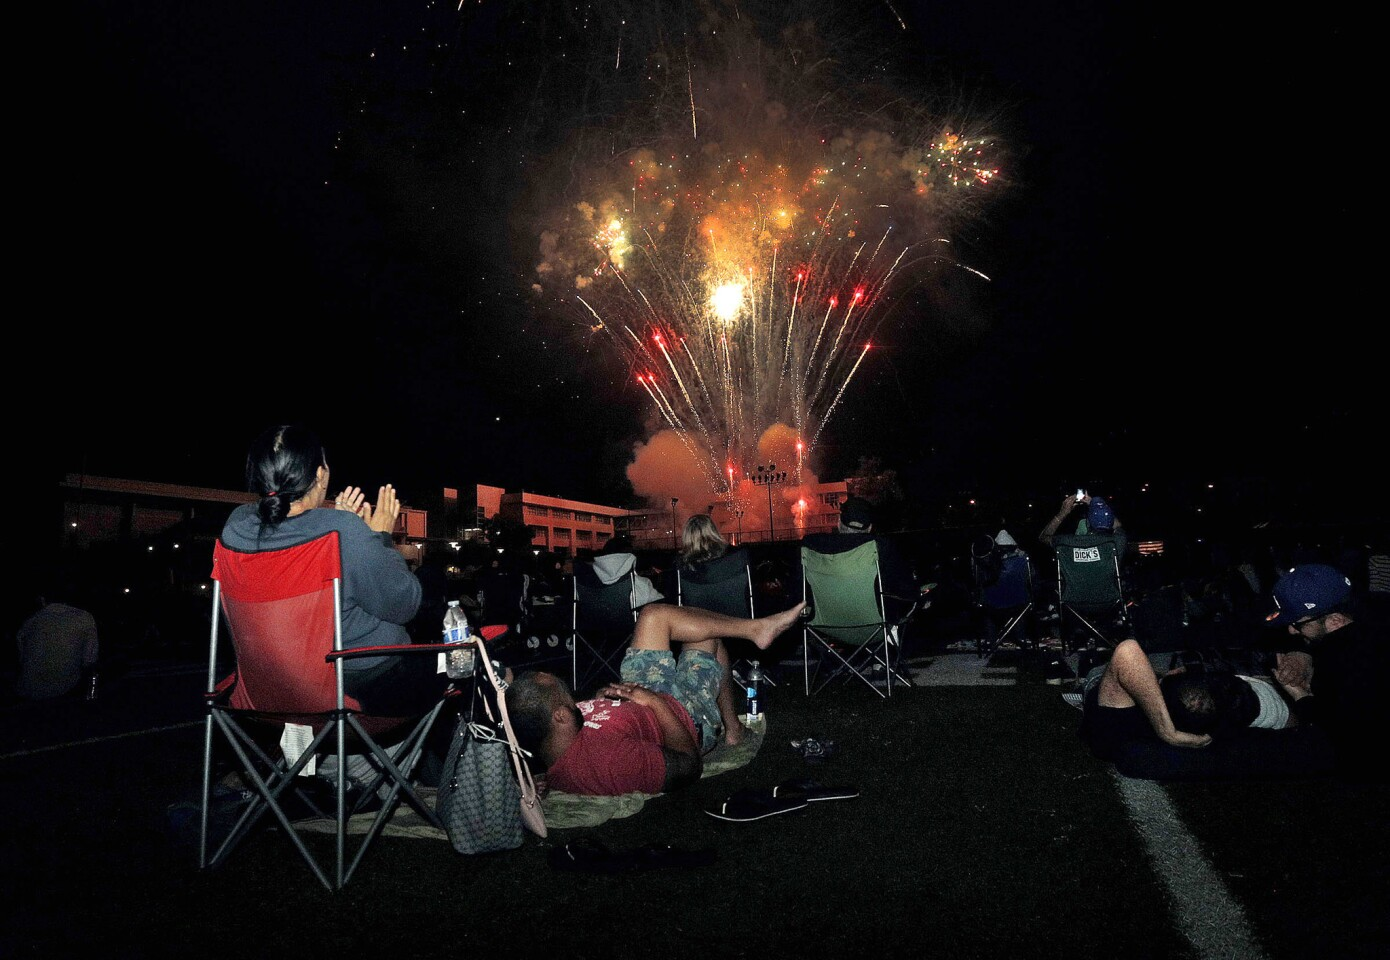 Photo Gallery: 14th annual Crescenta Valley Fireworks Association Fireworks Extravaganza at Crescenta Valley High School